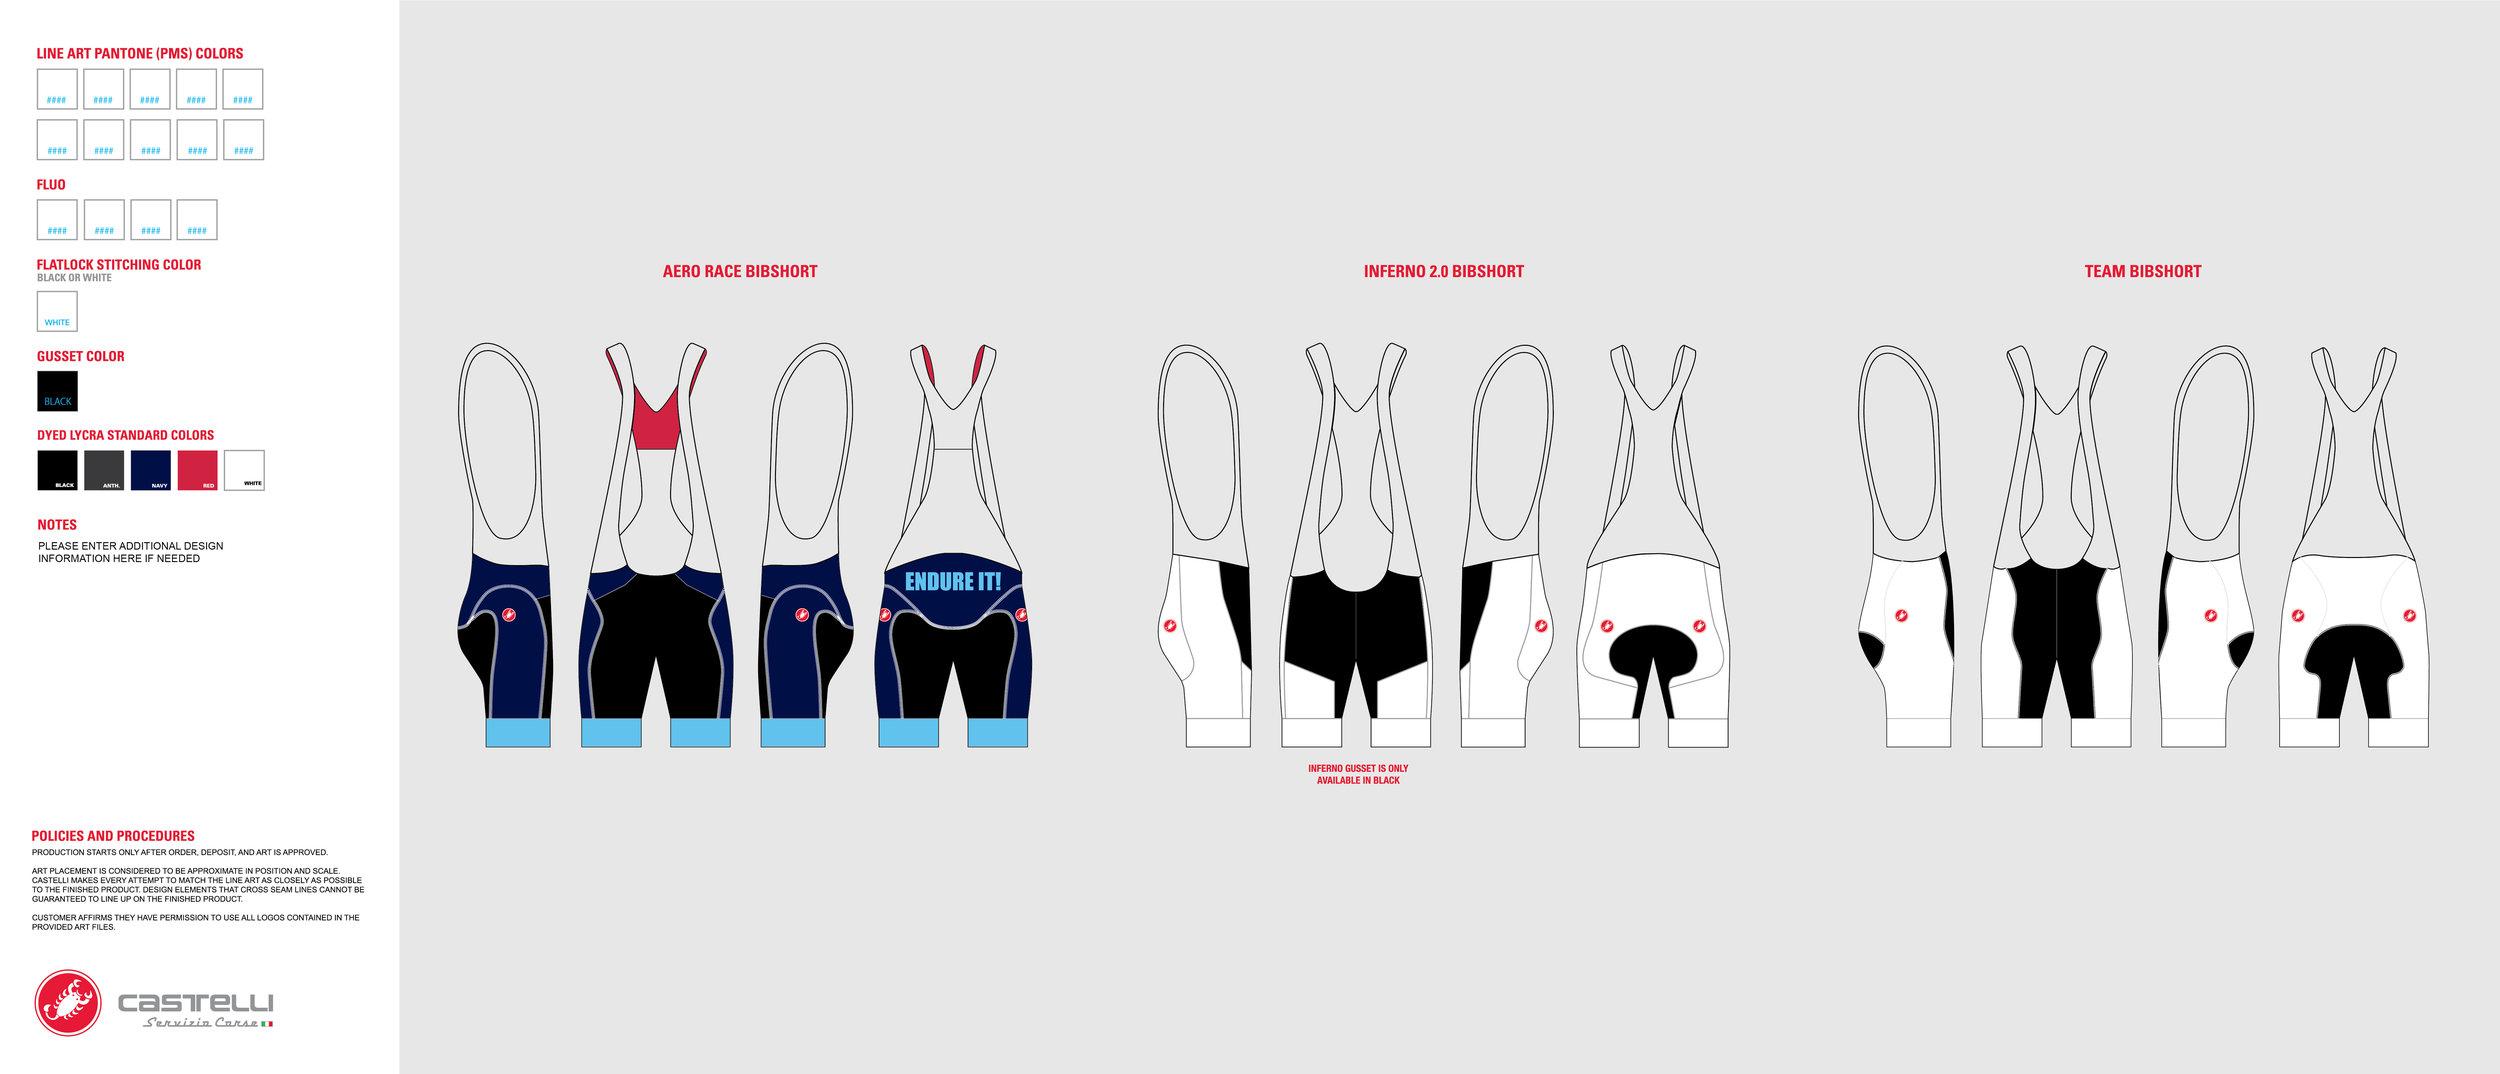 Endure it_18_Bib Shorts-01.jpg